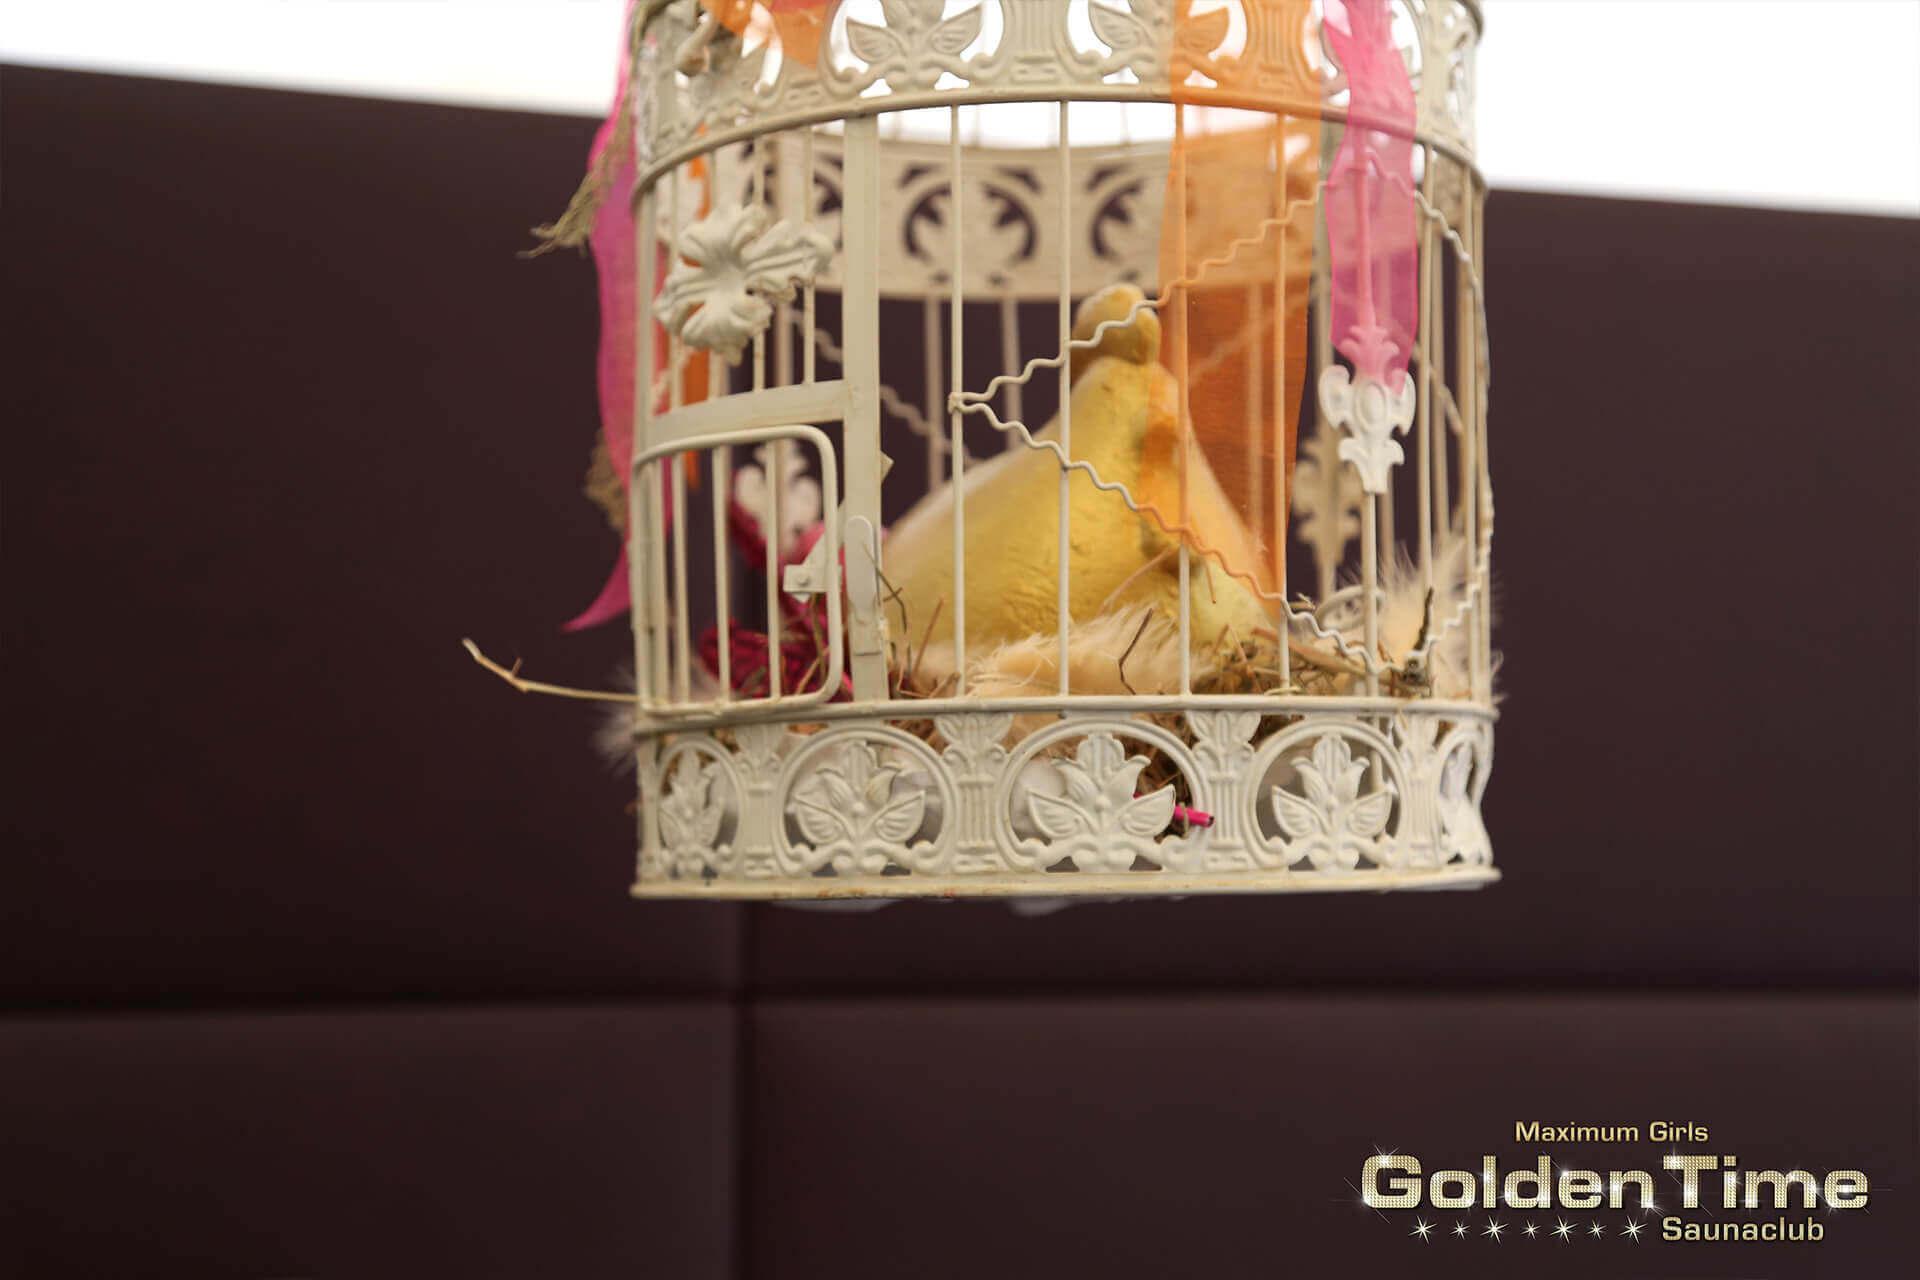 02-ostern-2016-pic-22-goldentime-saunaclub.jpg